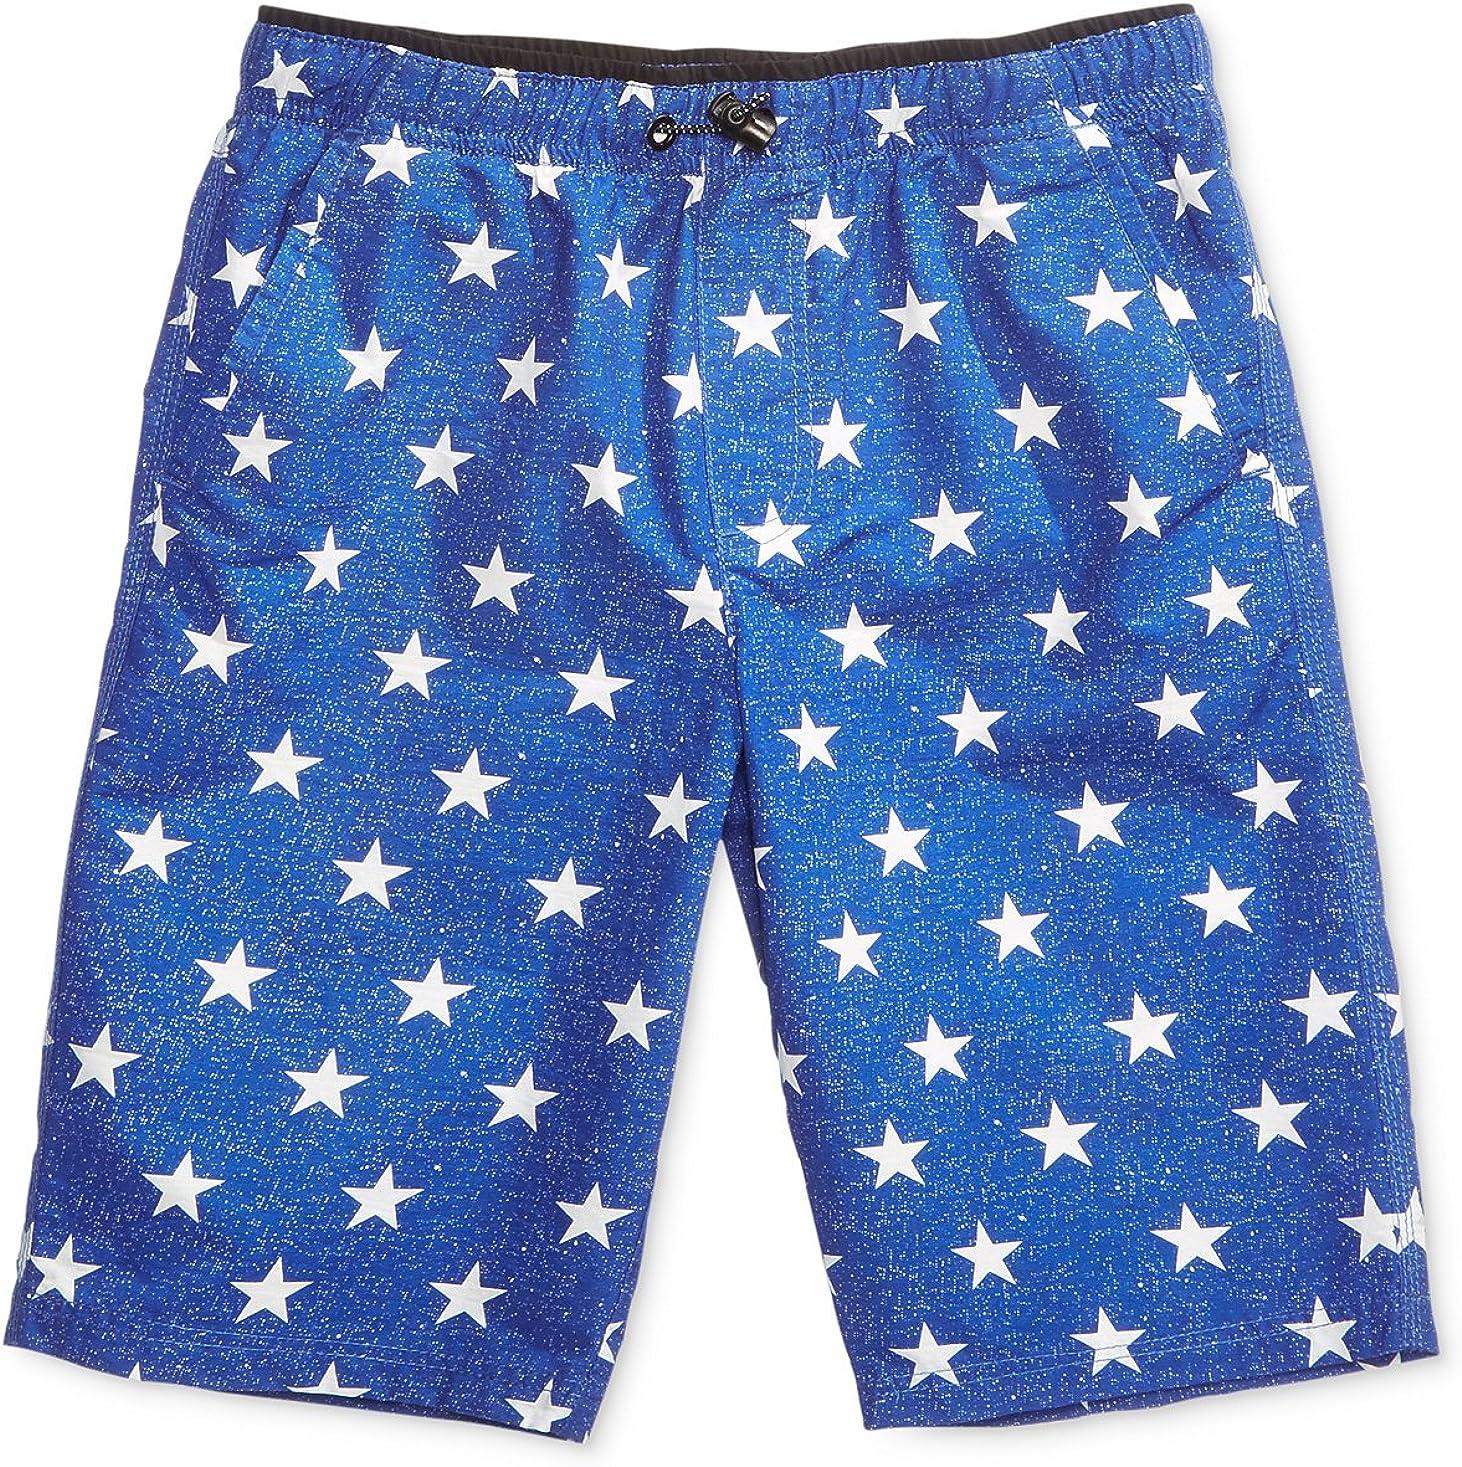 Univibe Graphic-Print Shorts, Big Boys, Blue, Size: L